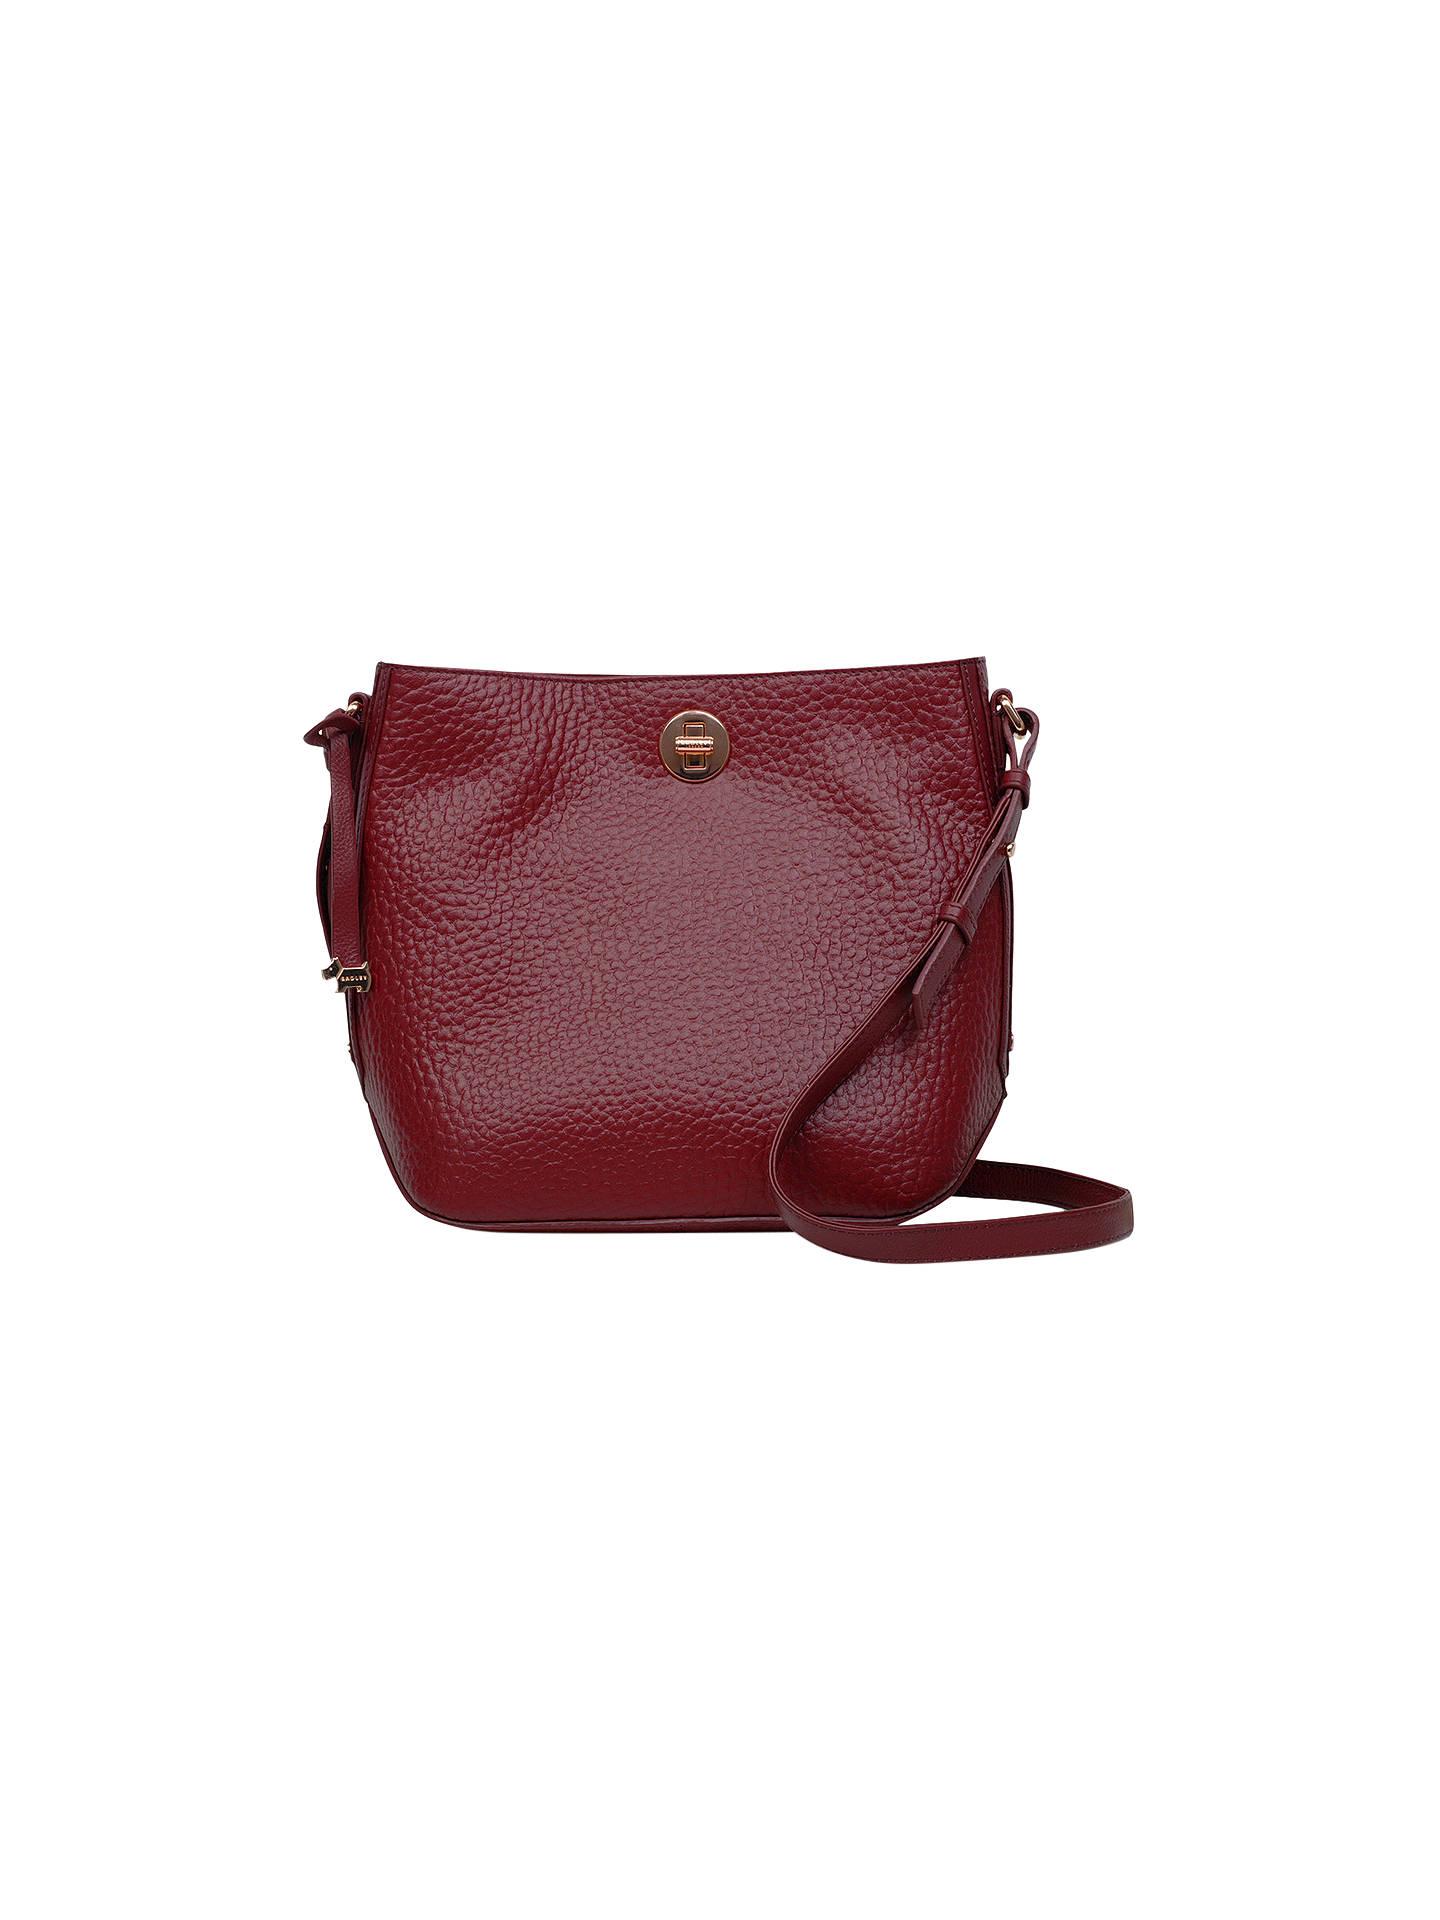 Radley Carey Street Leather Bucket Cross Body Bag Berry Online At Johnlewis